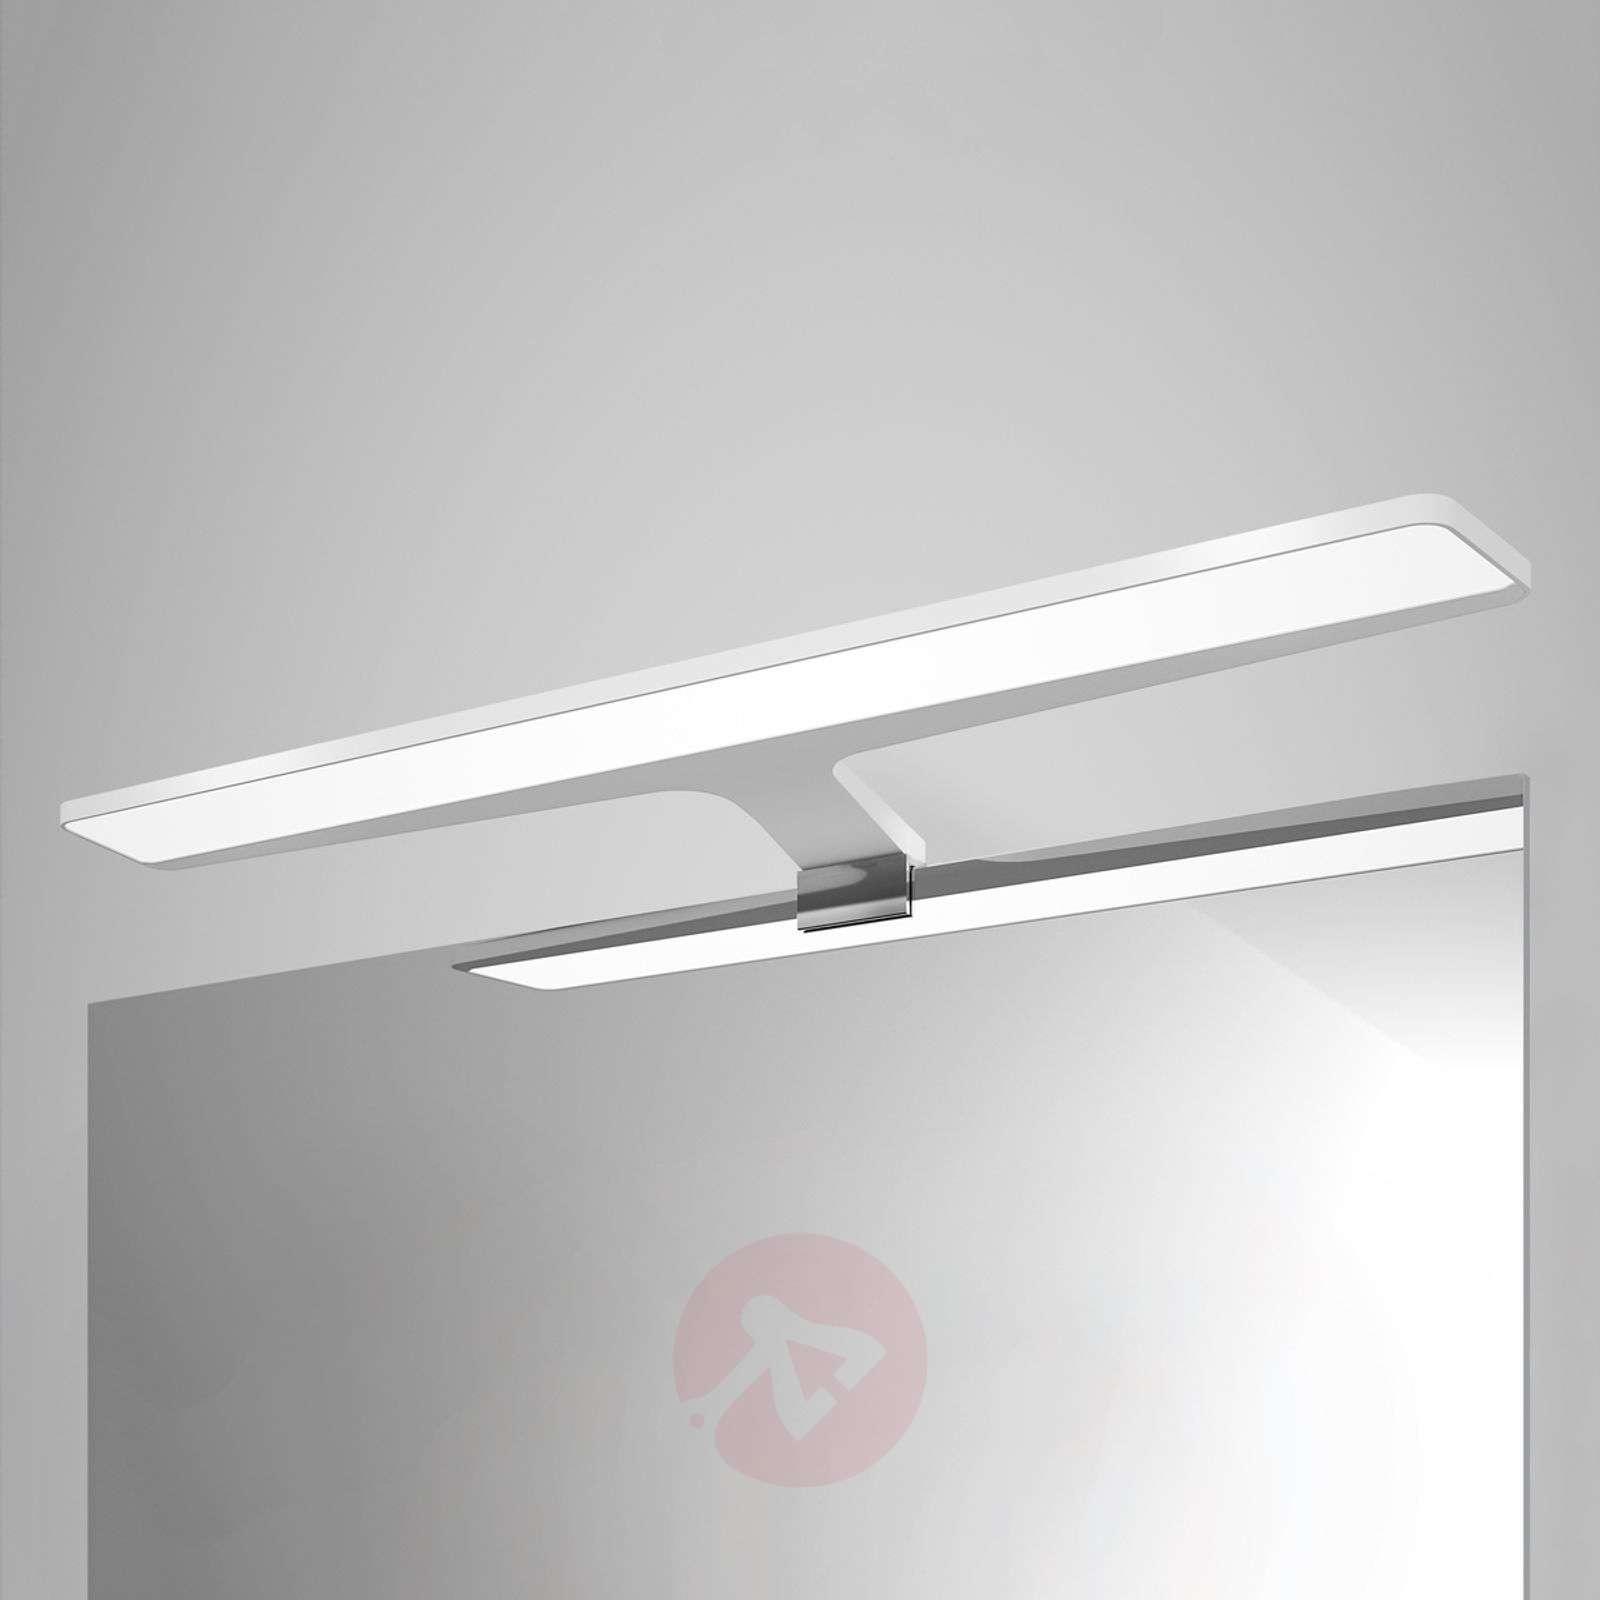 Nayra white LED mirror light-3052041-05